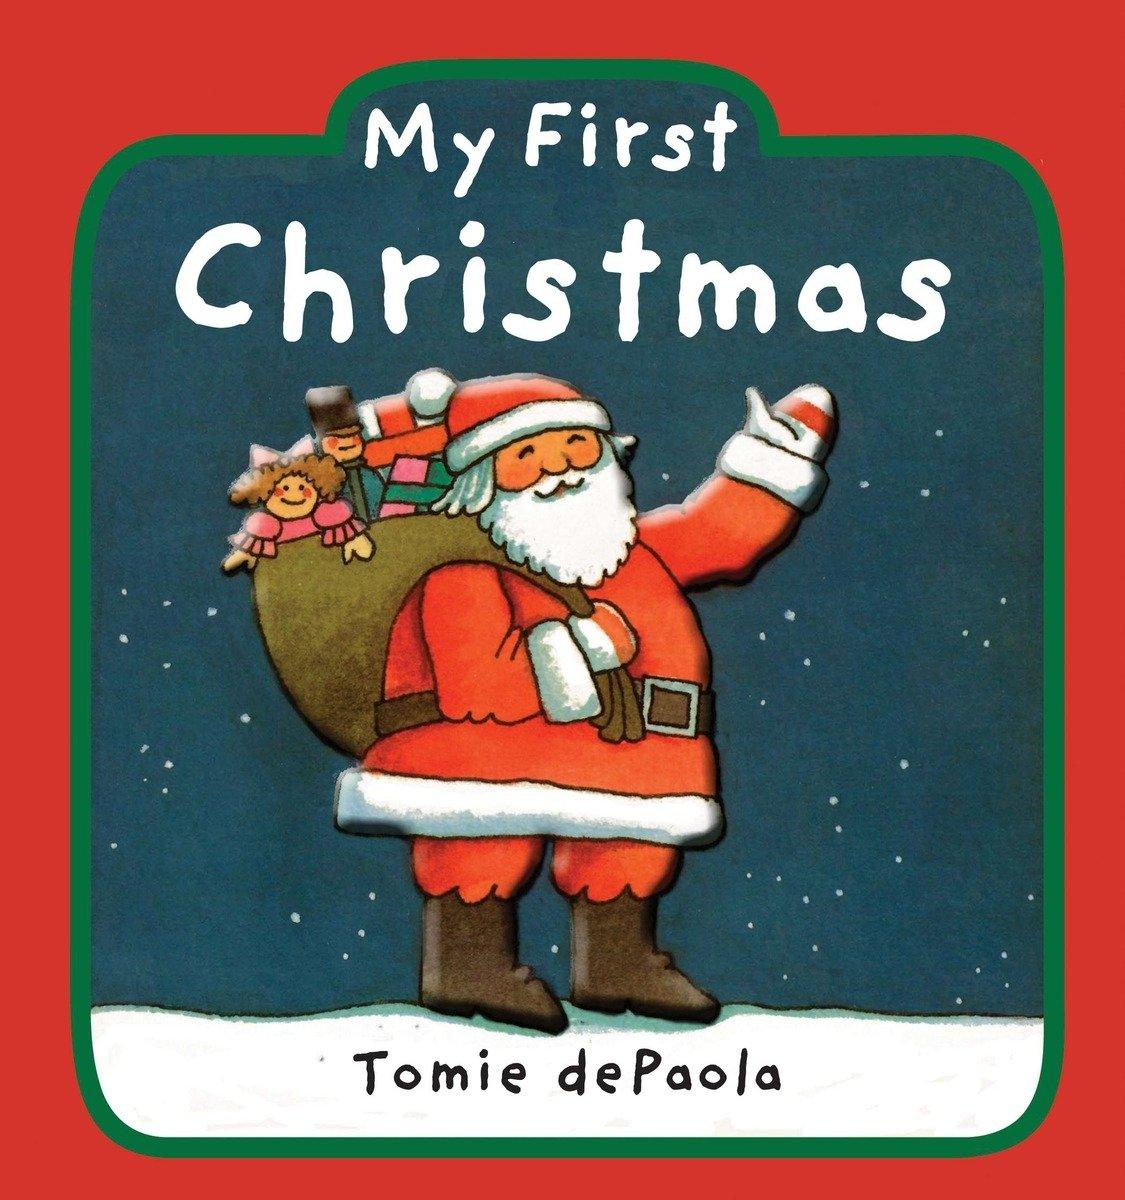 shegotguts - christmas books - my first christmas.jpg